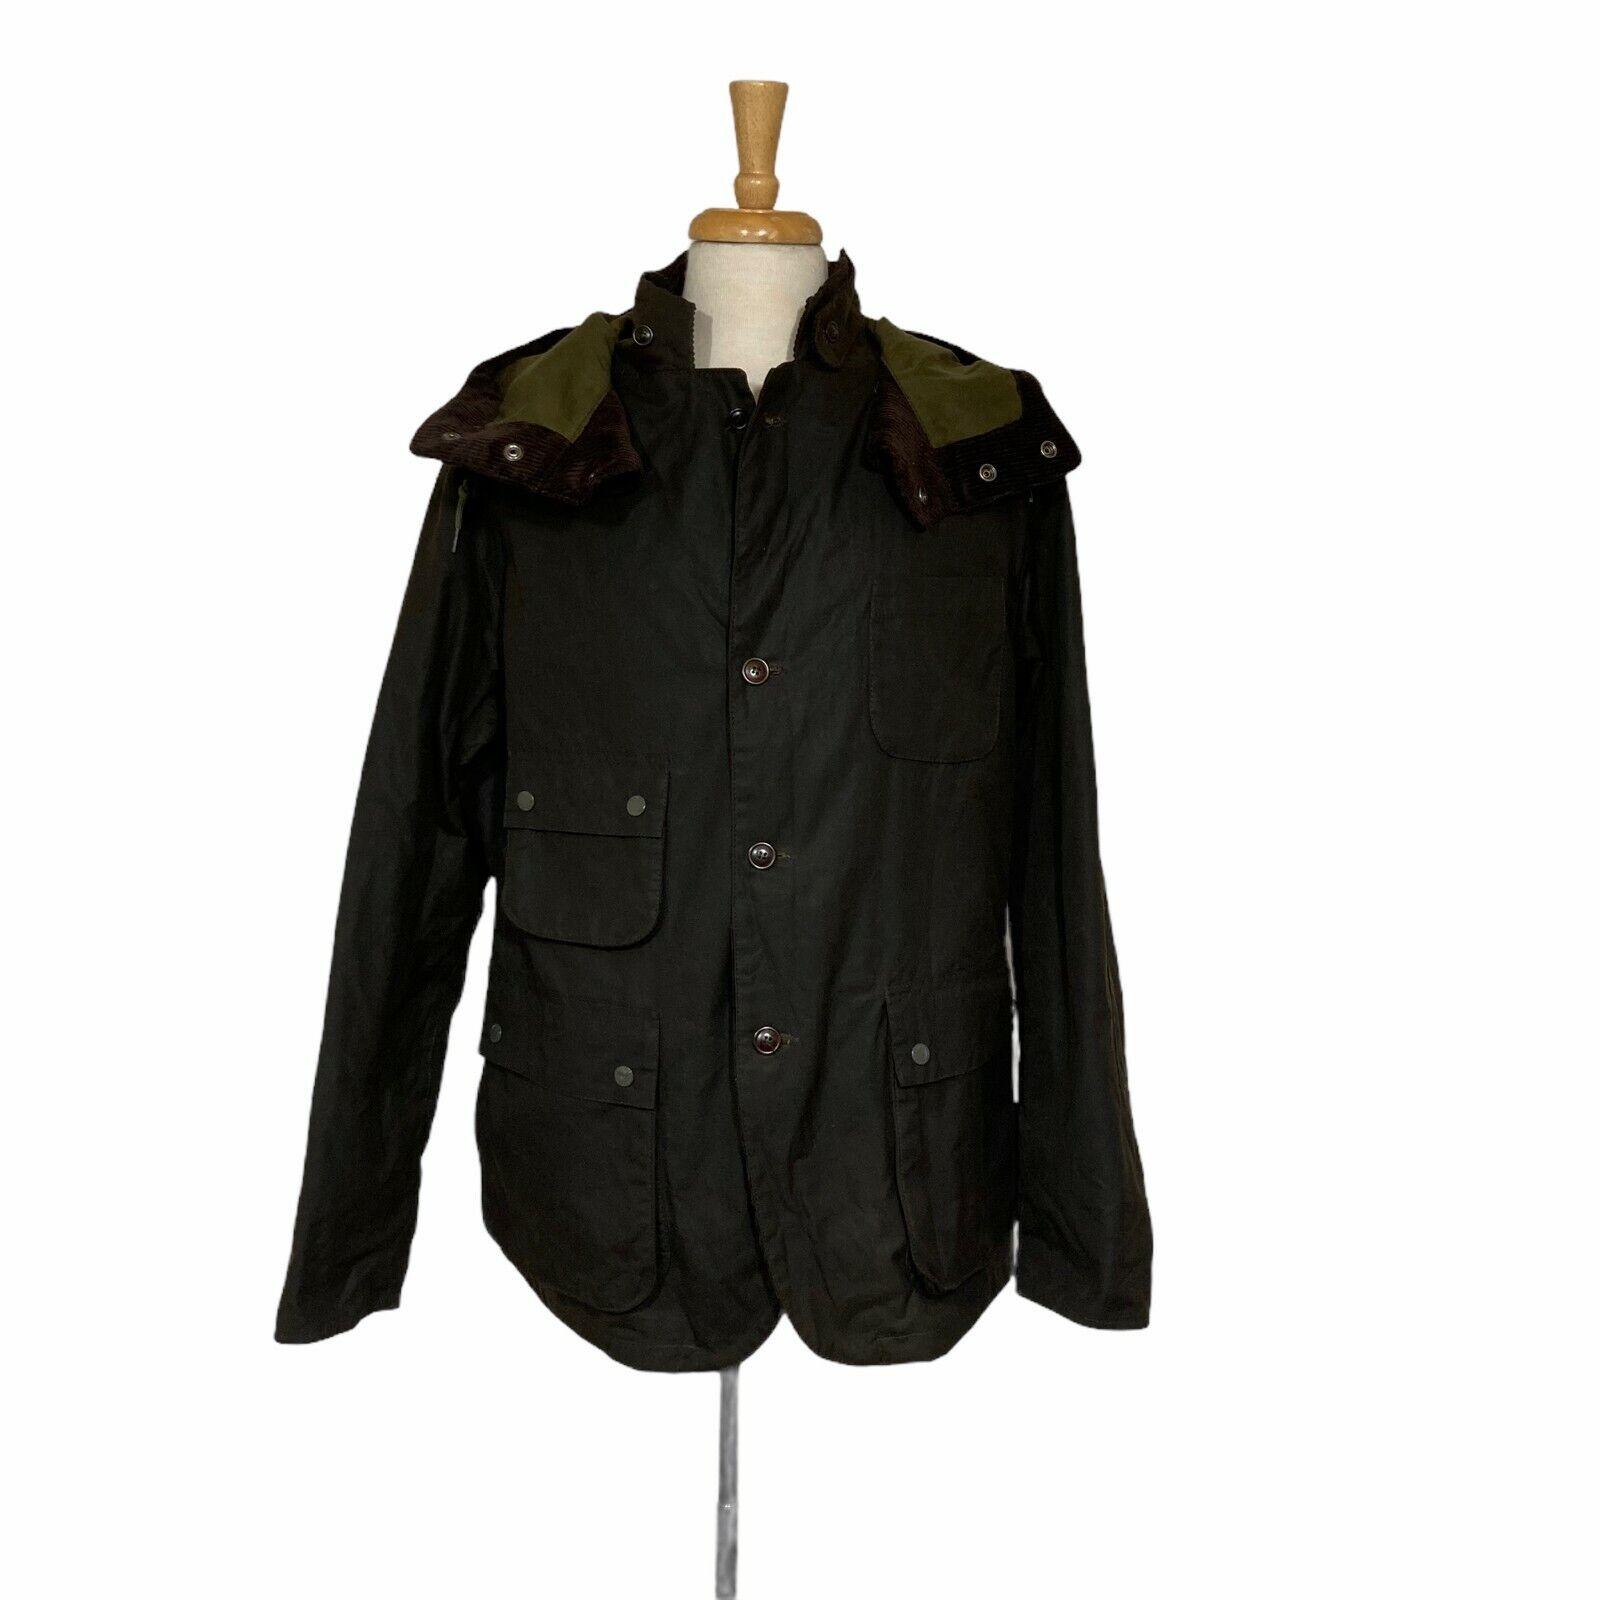 Barbour x Engineered Garments Upland Wax Jacket L - image 1